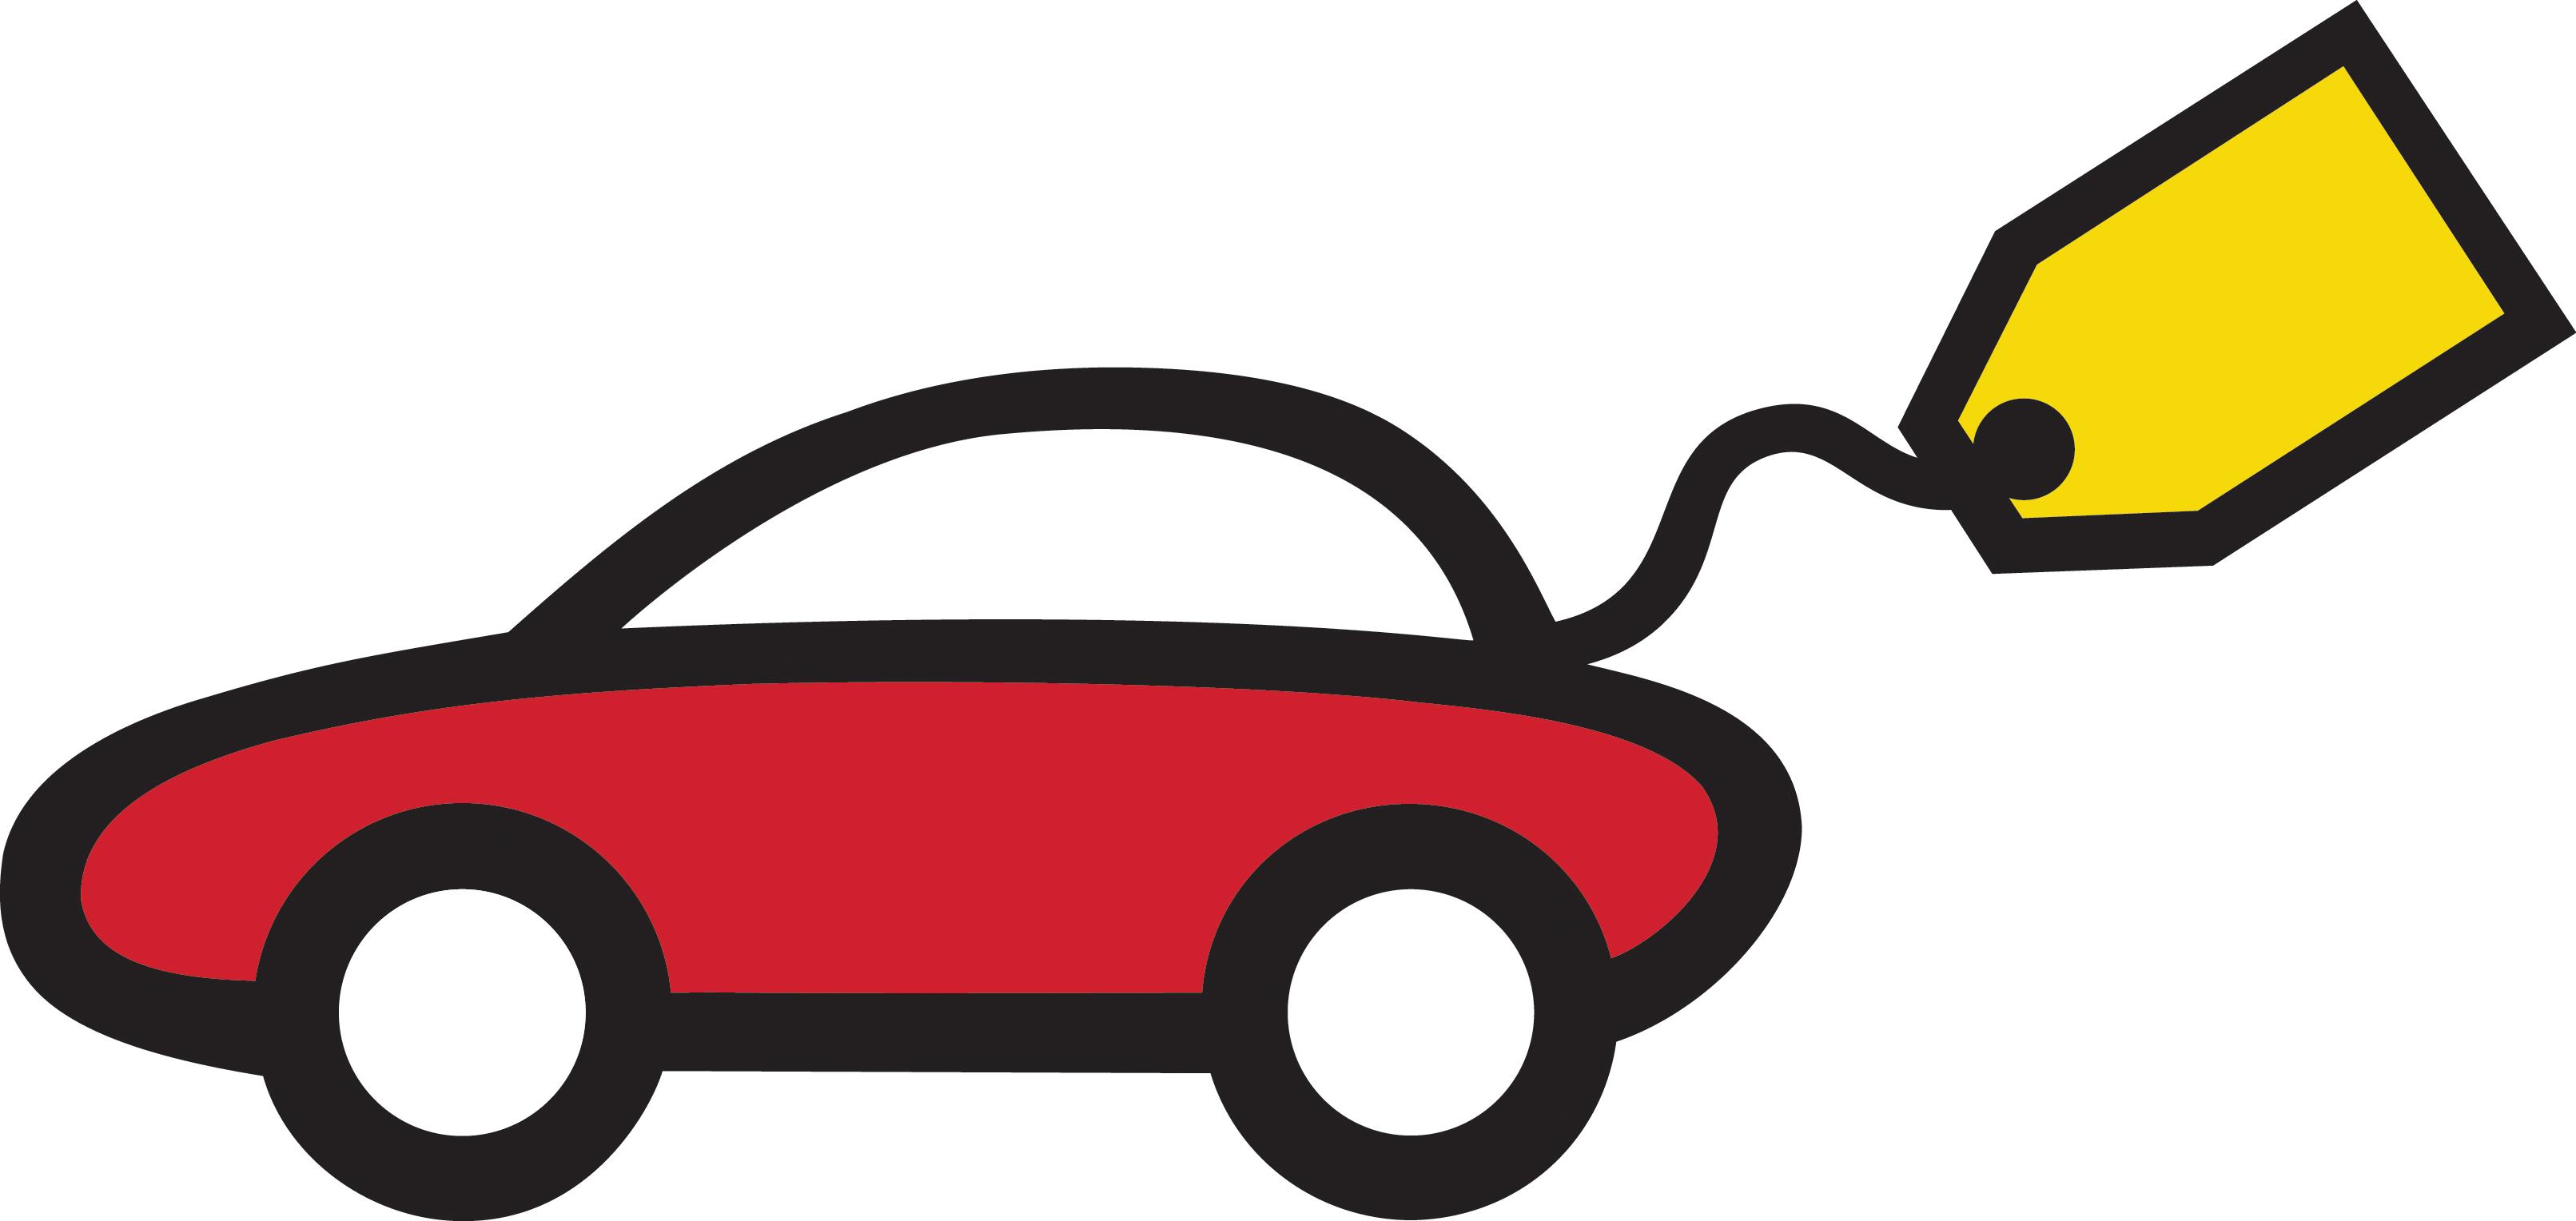 Car dealership clipart jpg royalty free stock Dealership Clipart Car Dealership Free collection | Download and ... jpg royalty free stock